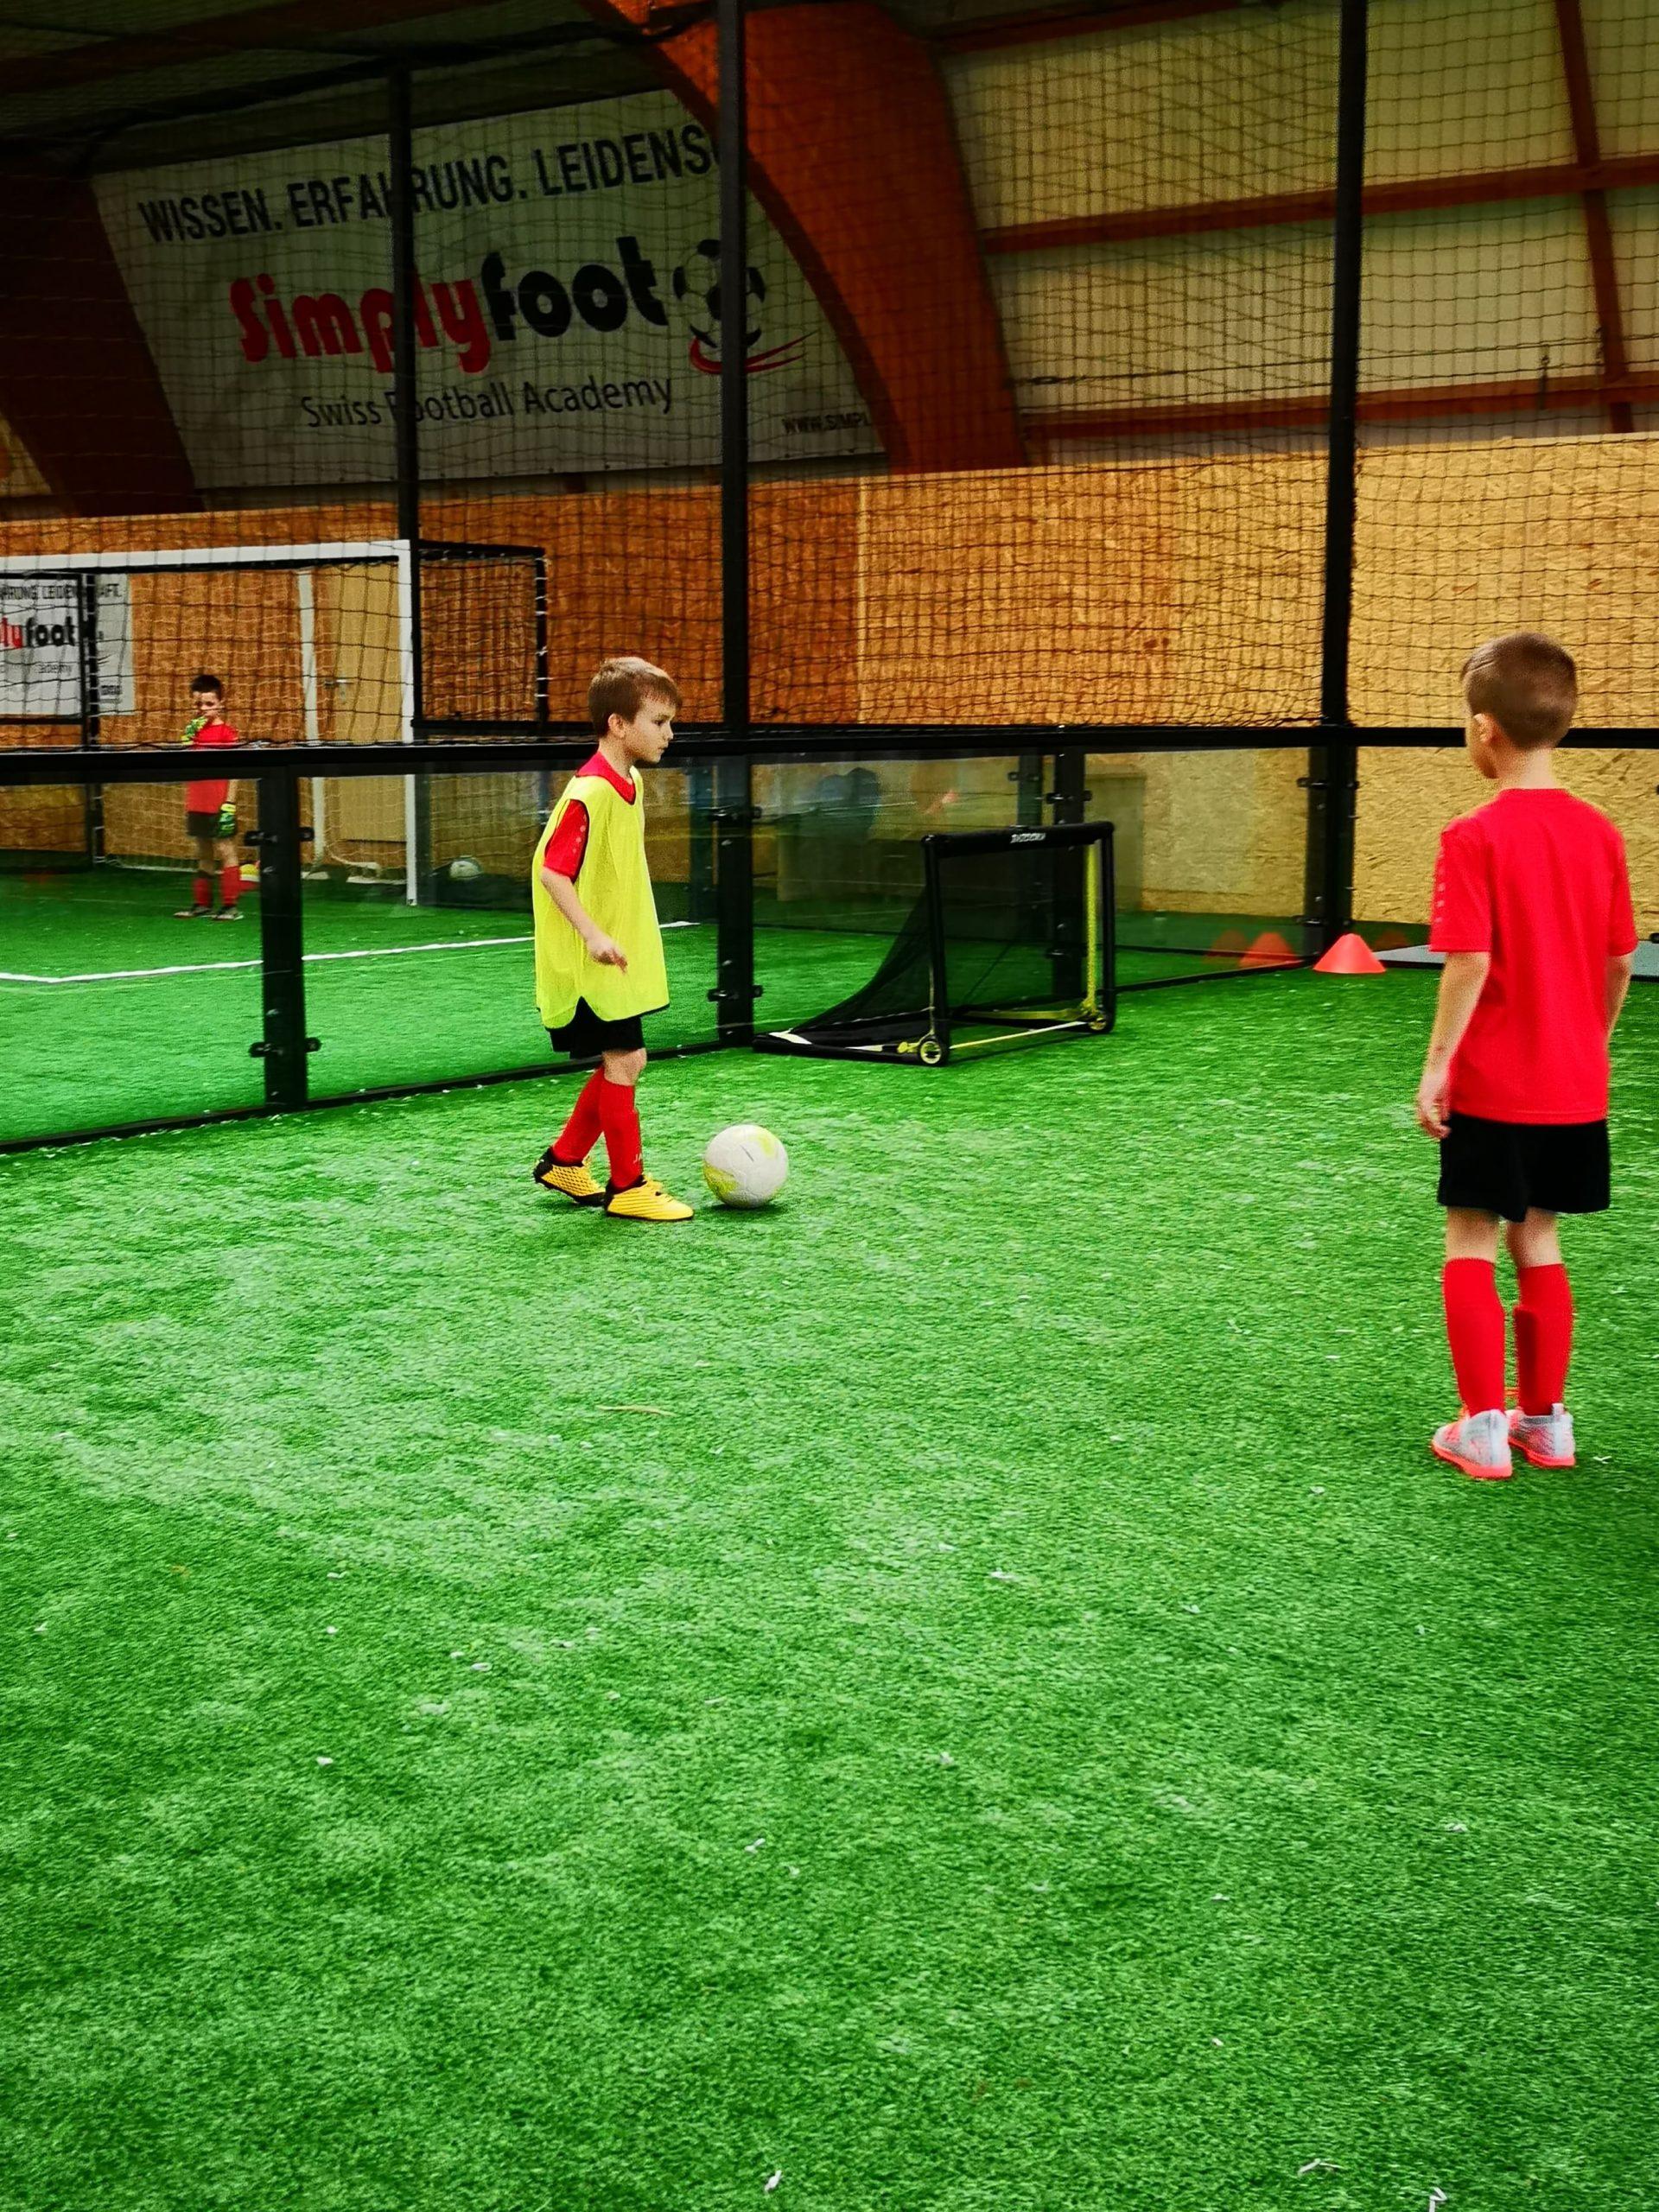 Fussballcamp Simplyfoot